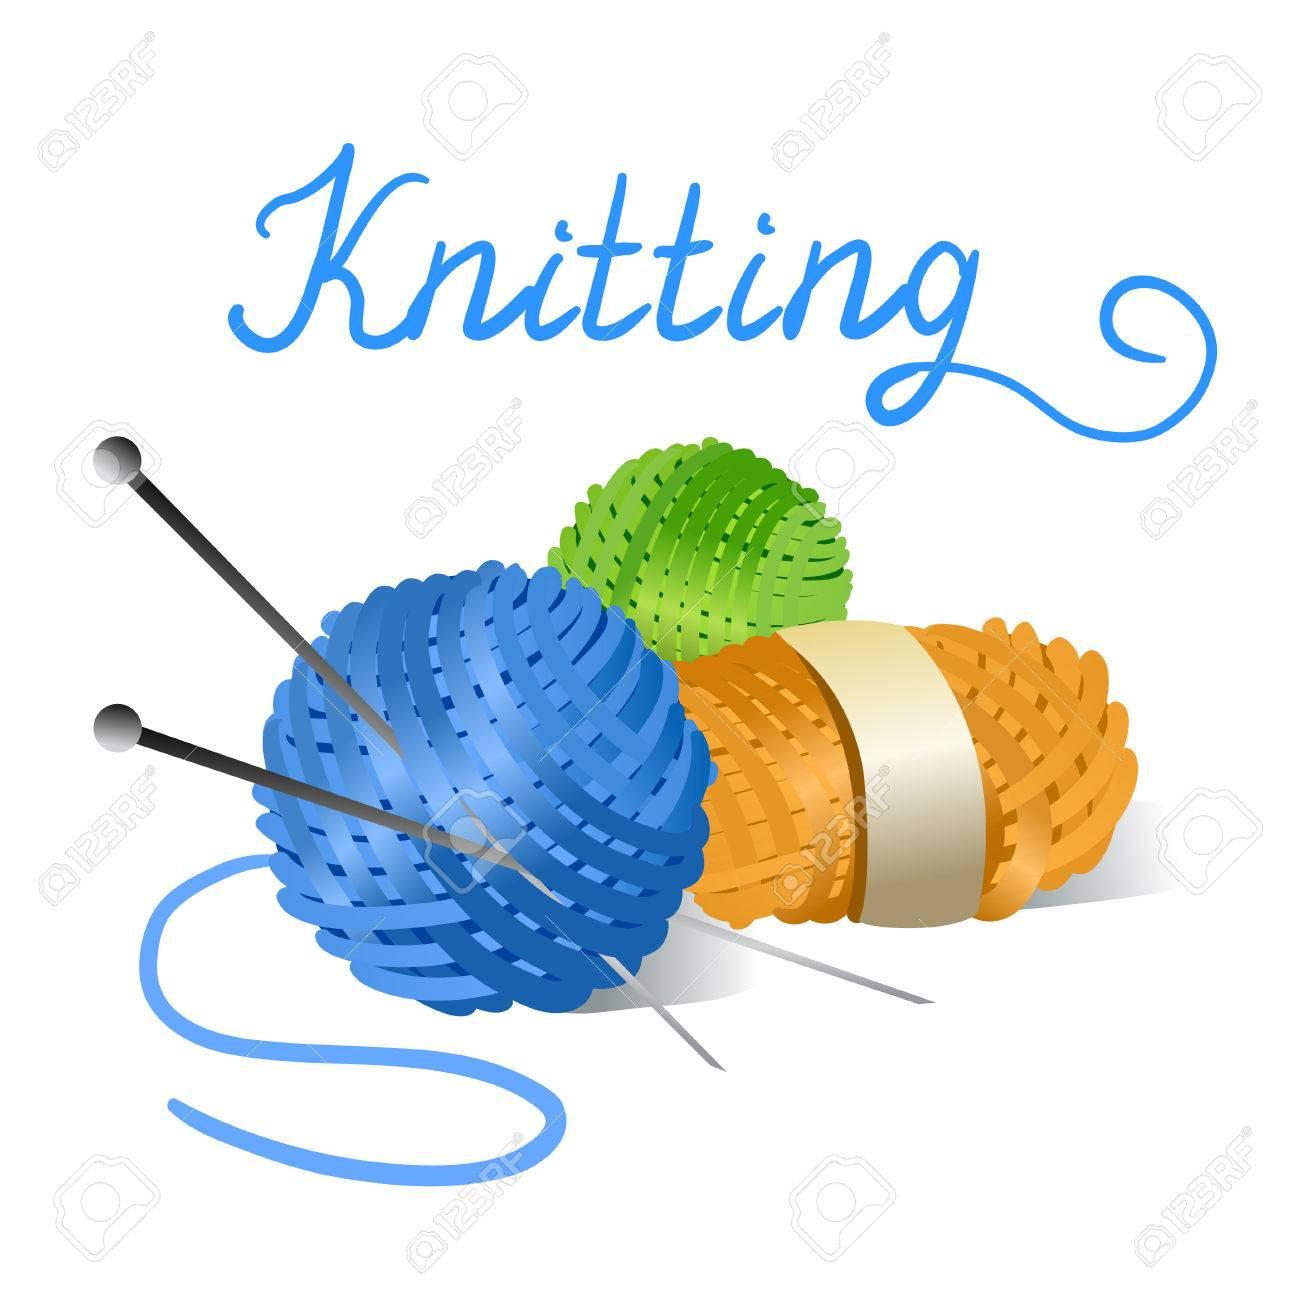 skein of yarn and knitting needles. Standard-Bild - 30094639